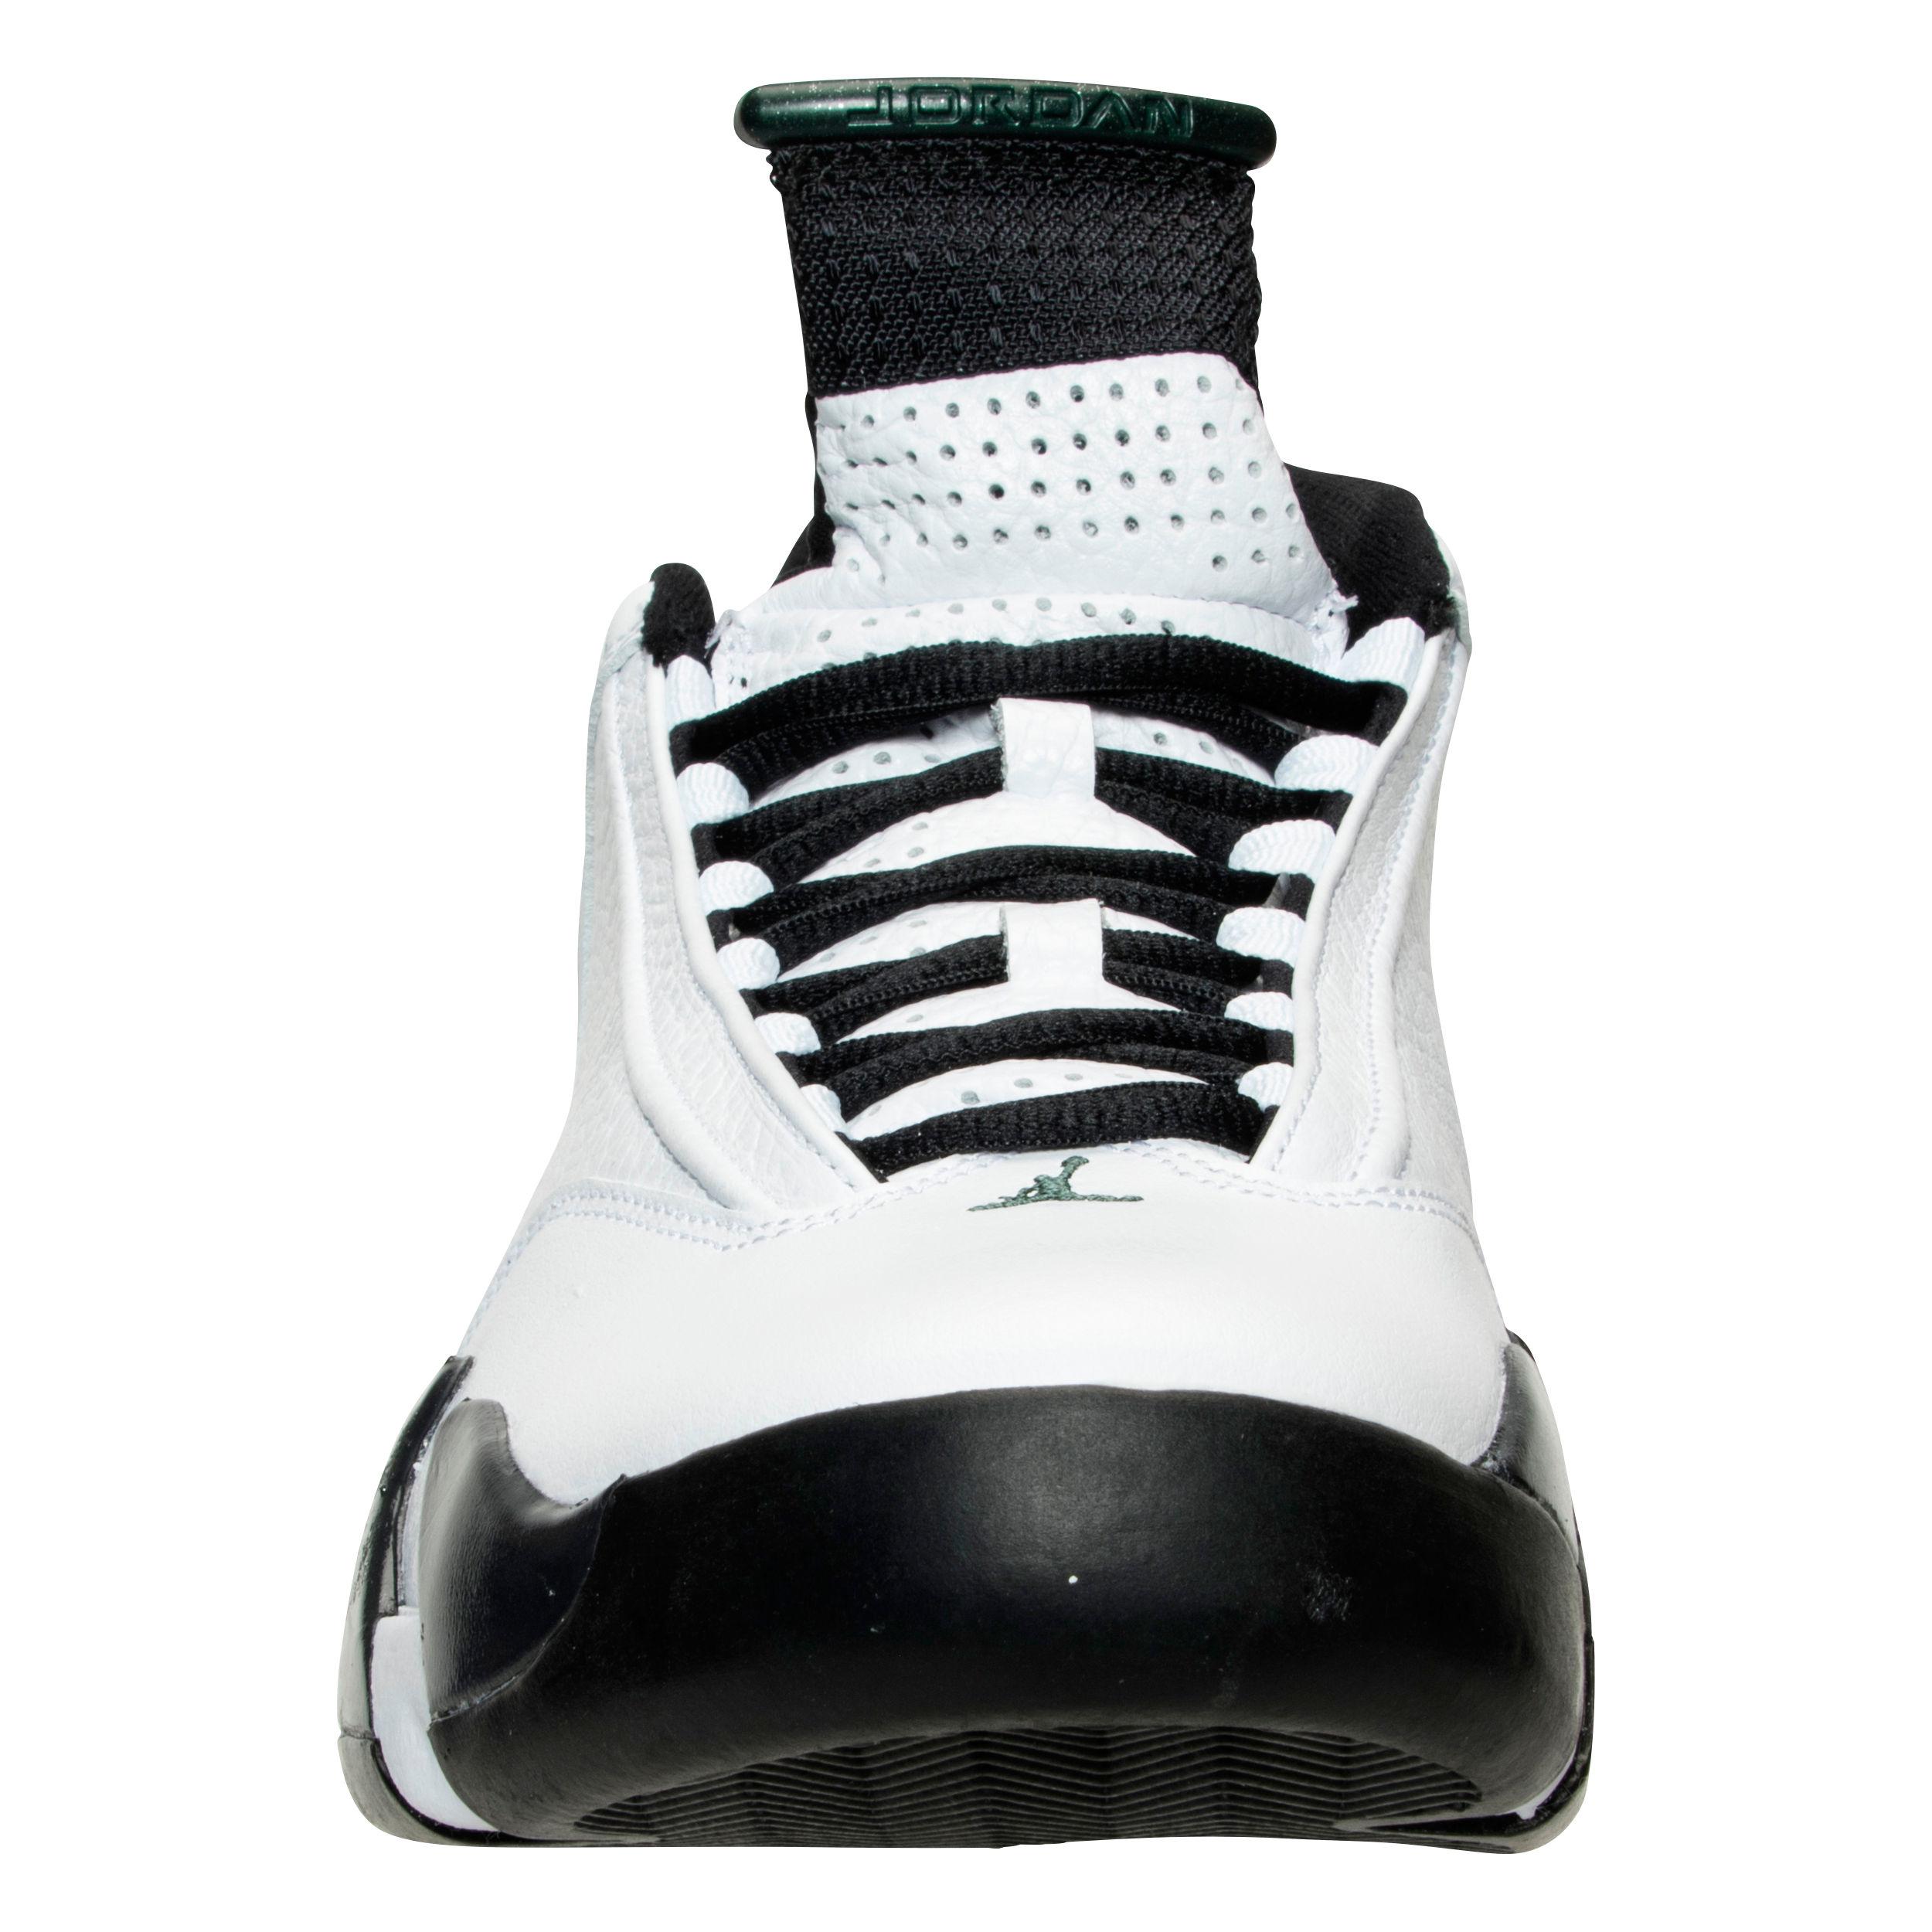 Air Jordan XIV Retro oxidized green 7